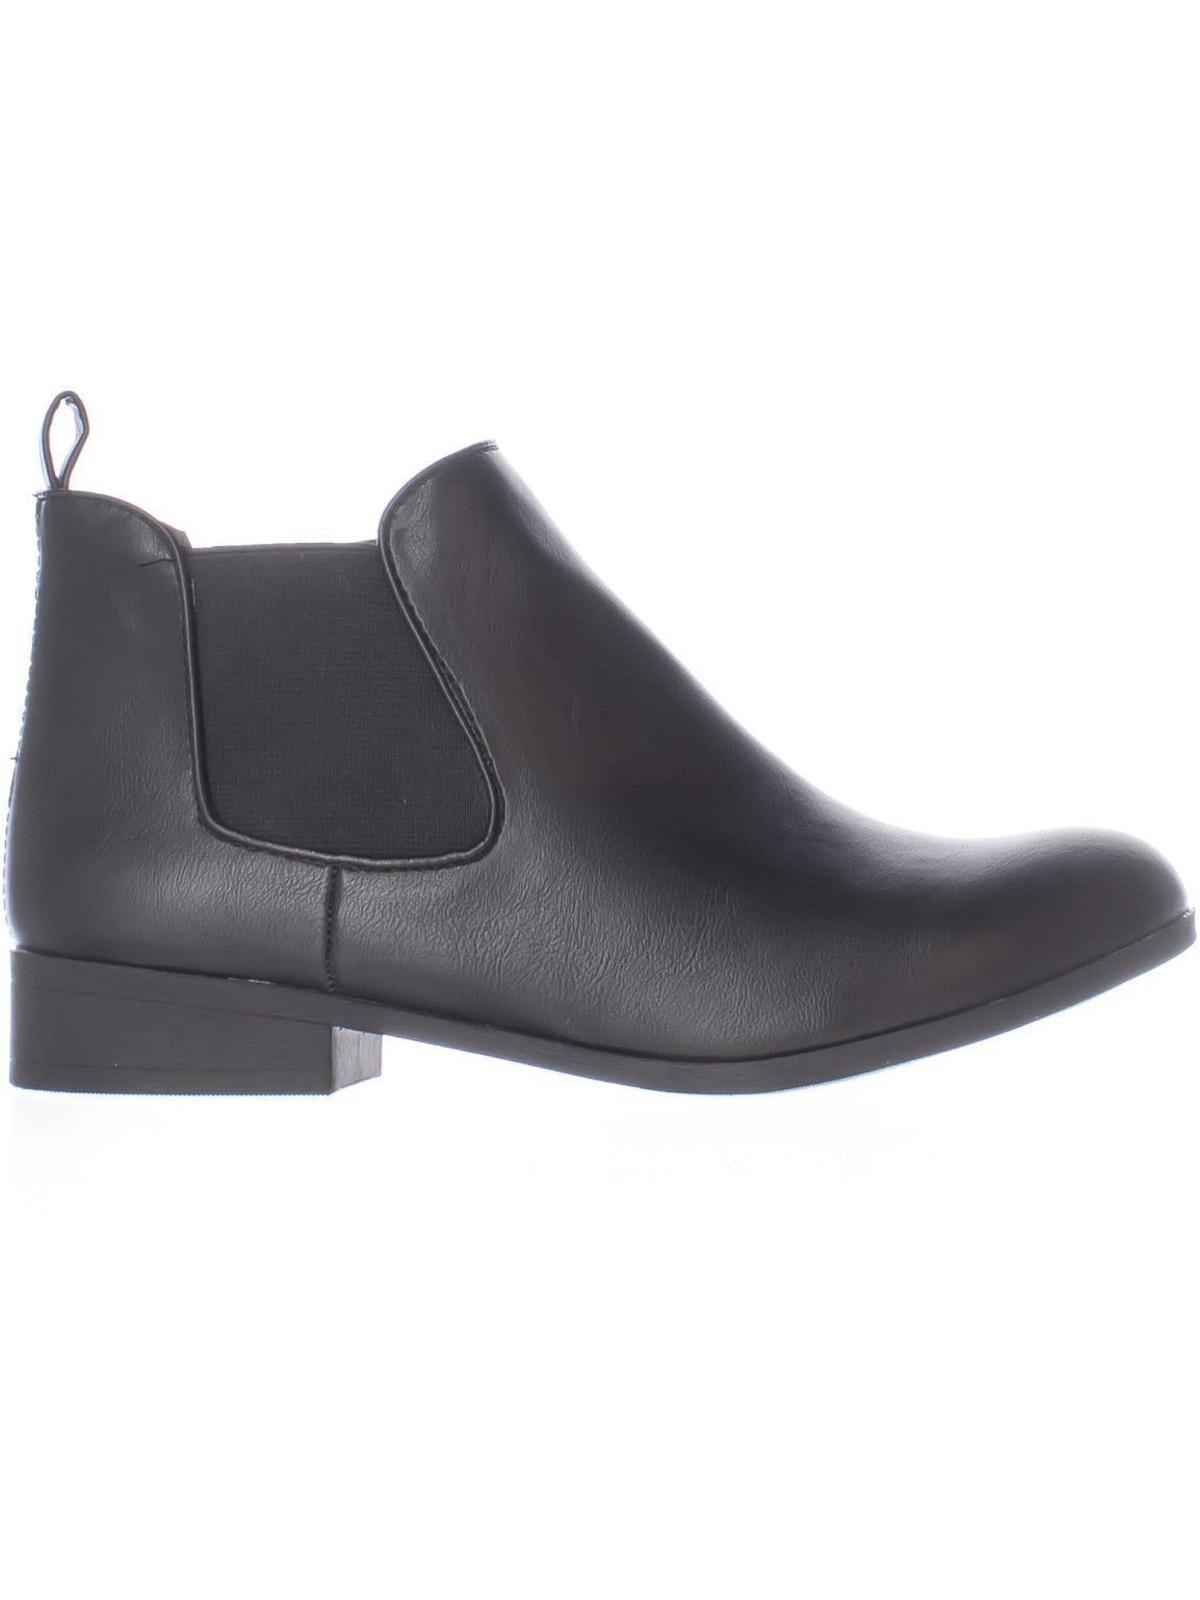 a4dc79e46e6 American Rag Womens Desyre Closed Toe Ankle Chelsea Boots